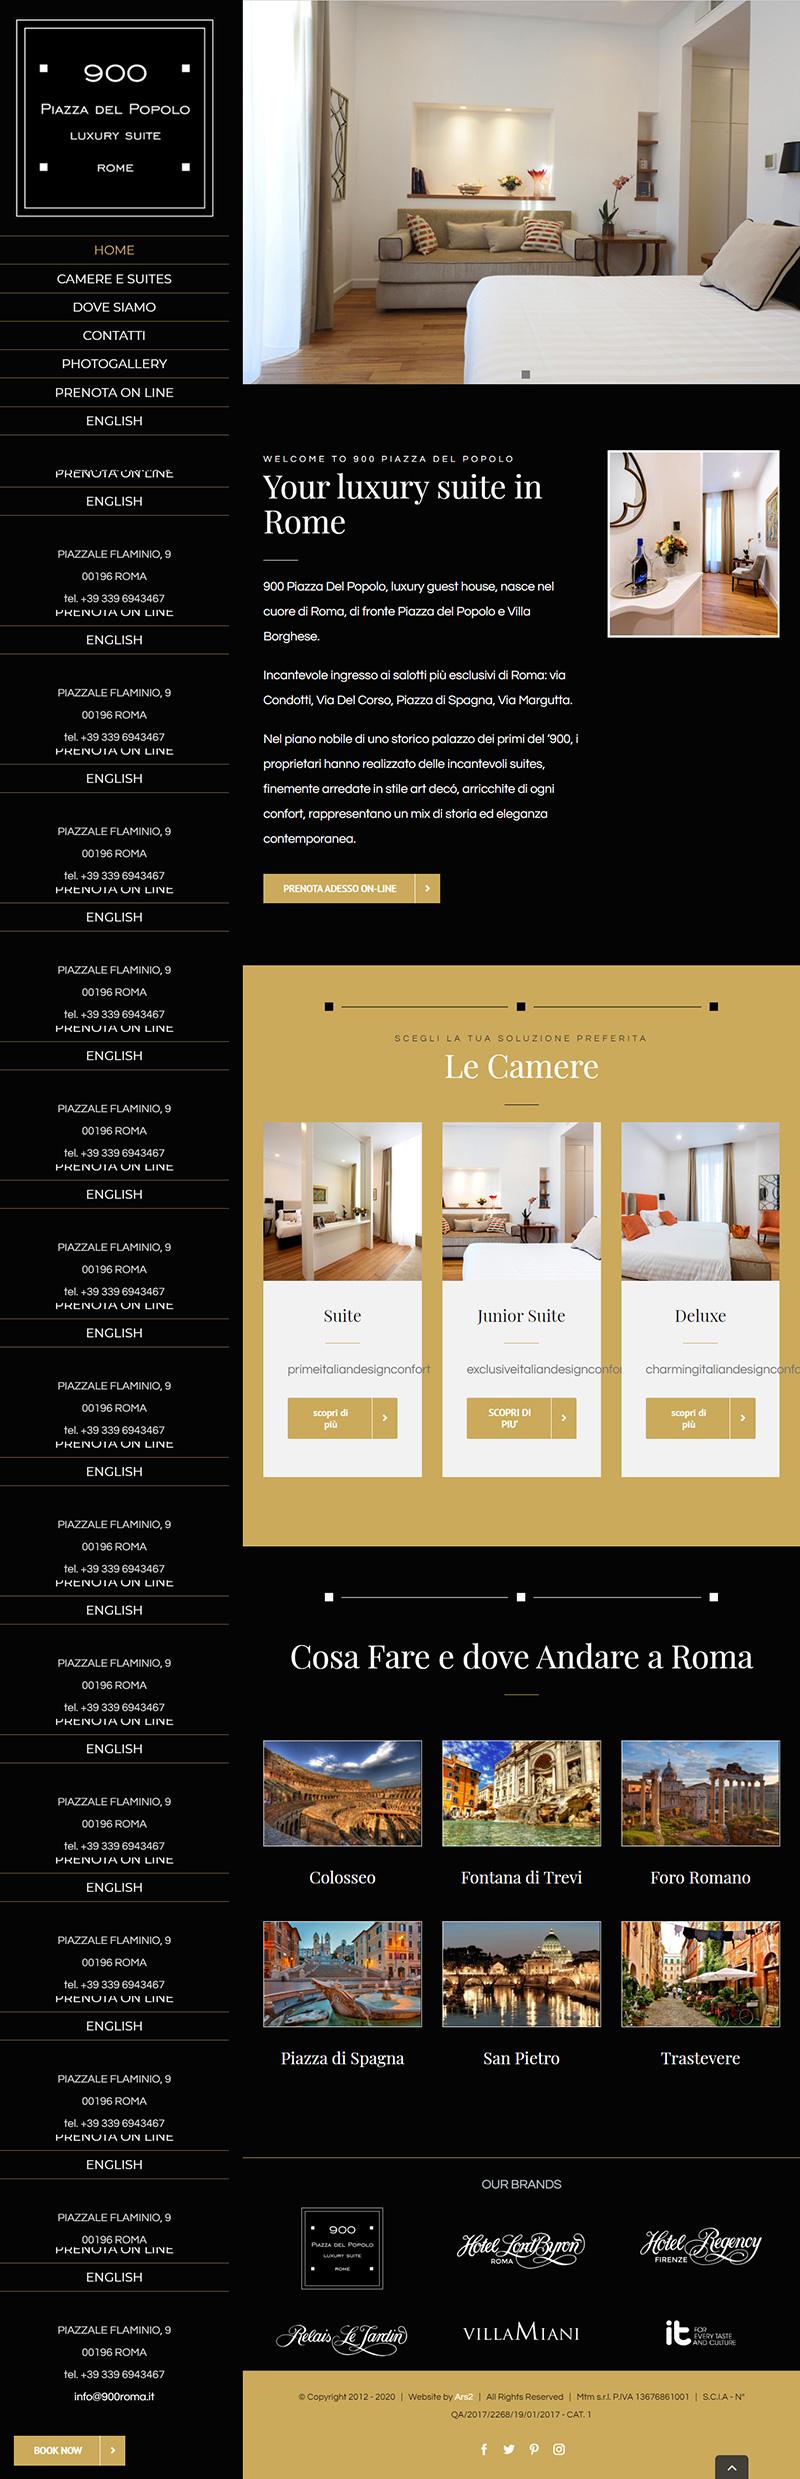 900roma.it - portfolio sito arsdue